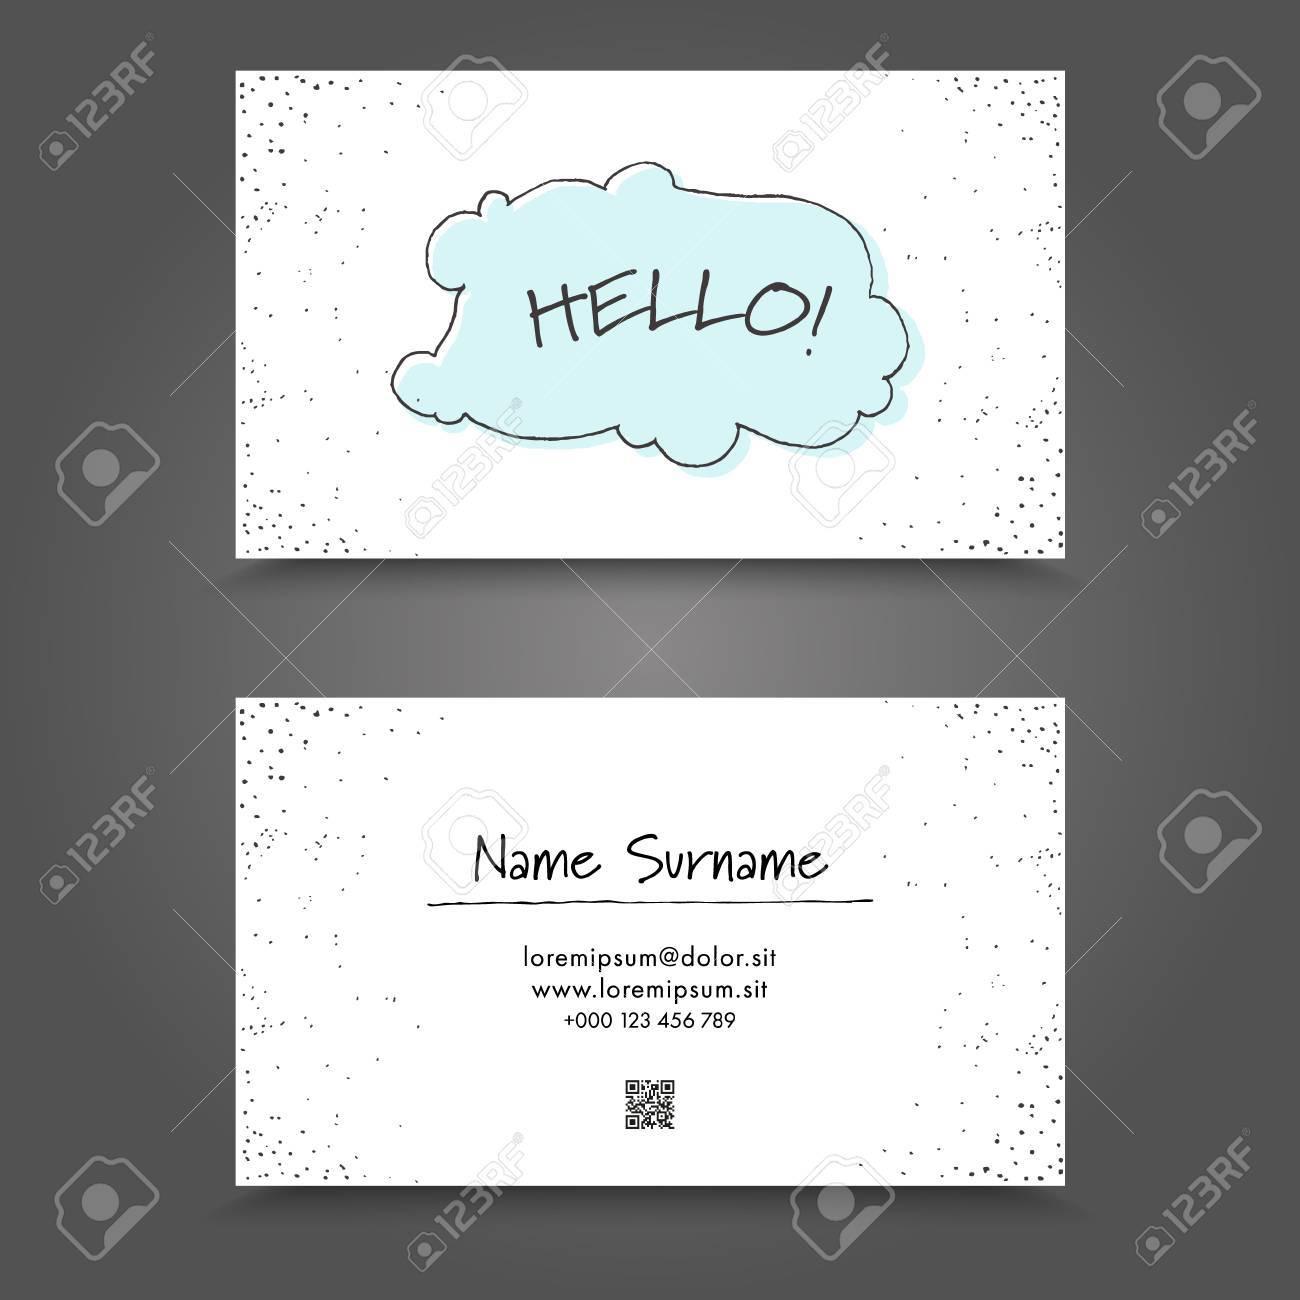 Carte De Visite Avec Handdrawing Cadre Drole Handdraw Business Card